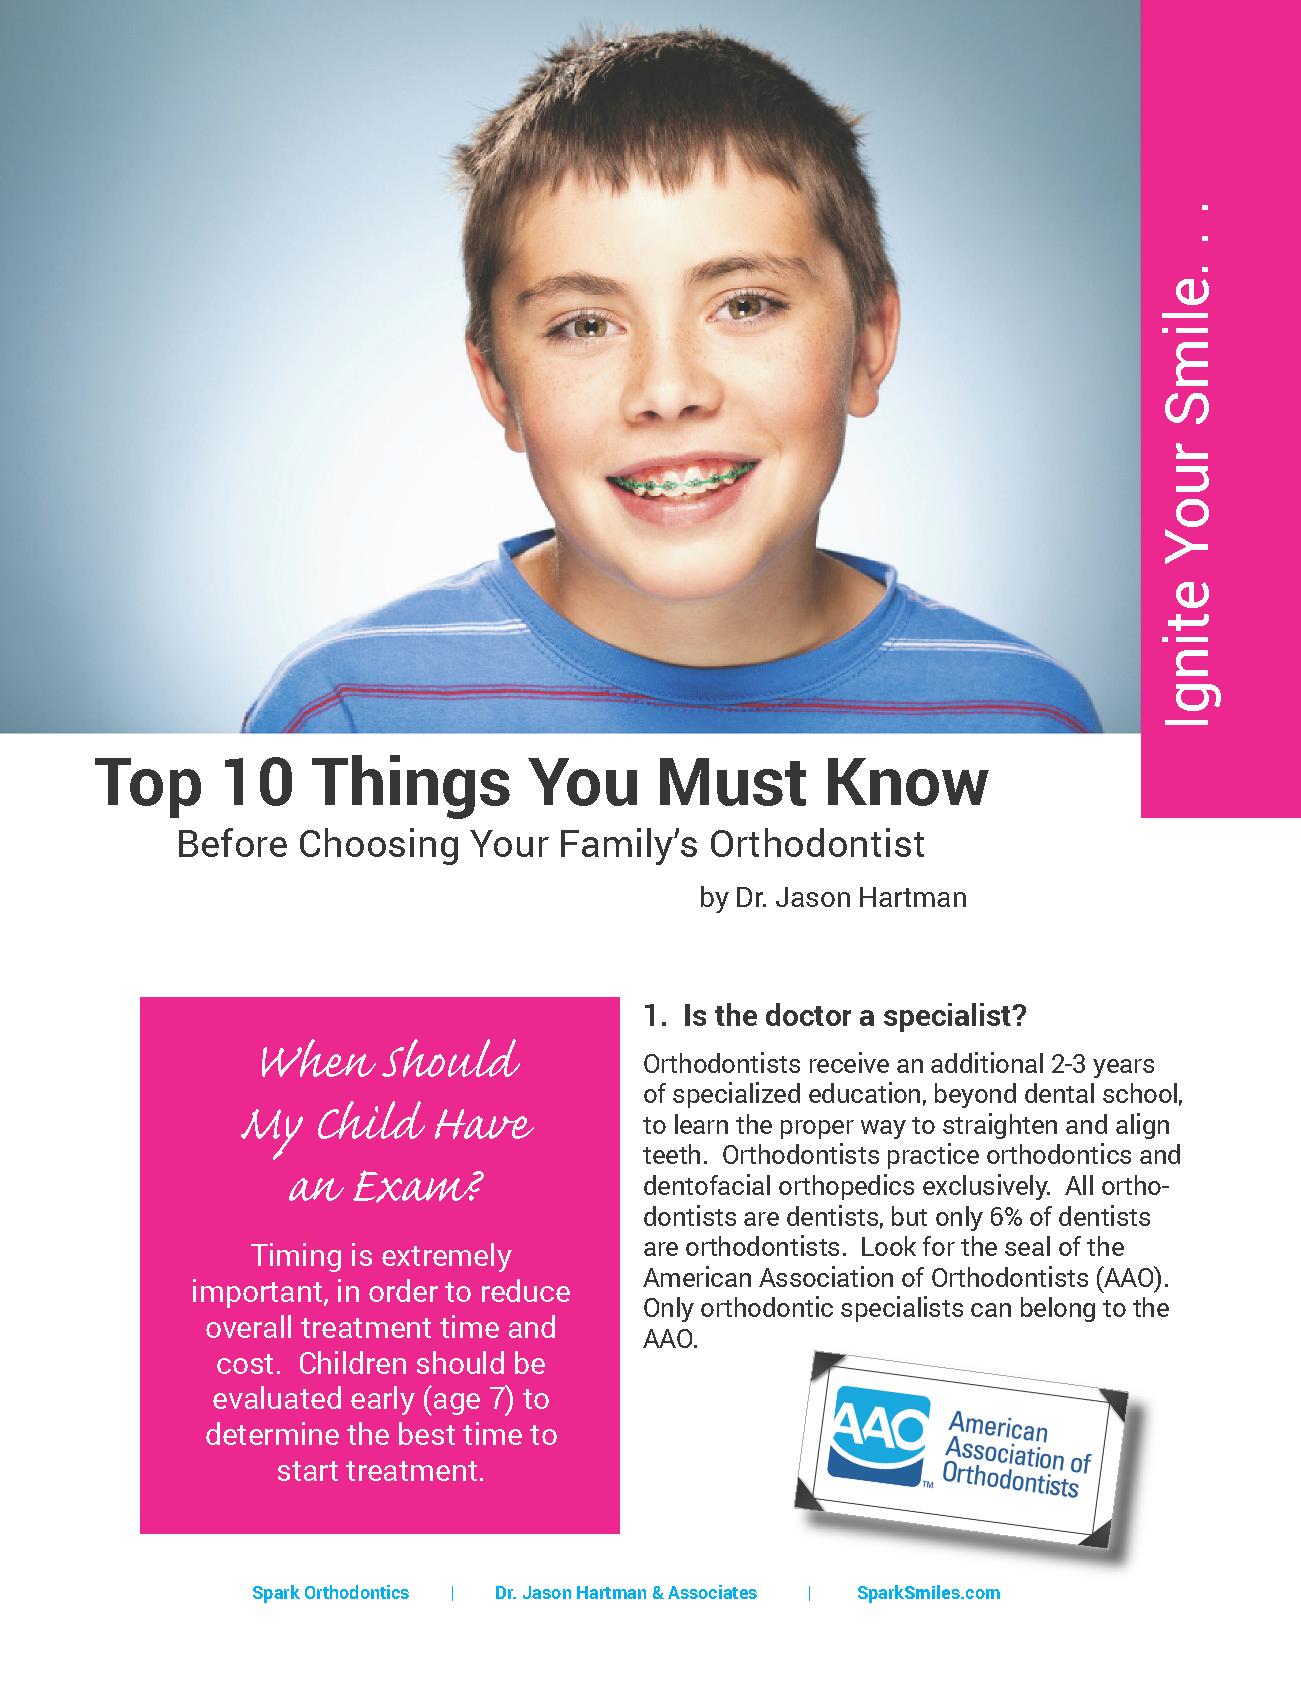 spark orthodontics top 10